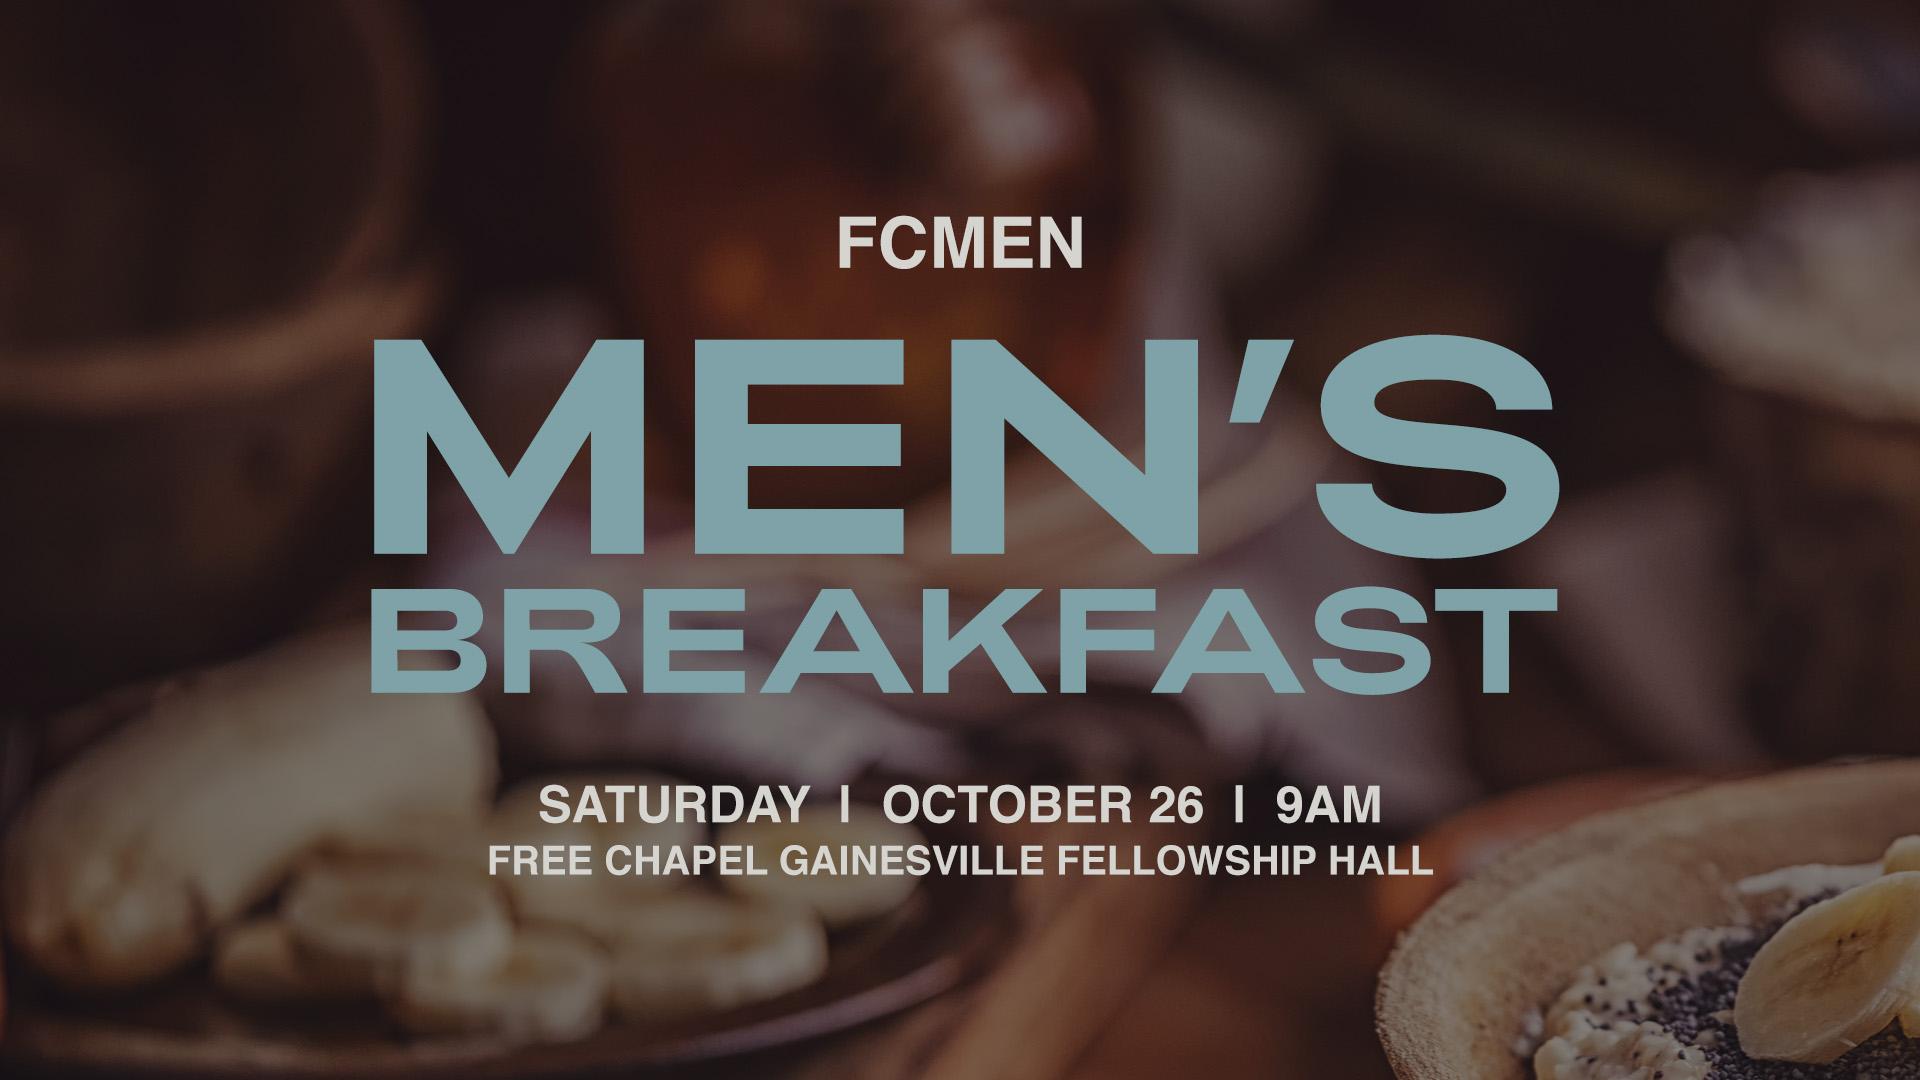 FCMen's Breakfast at the Gainesville campus